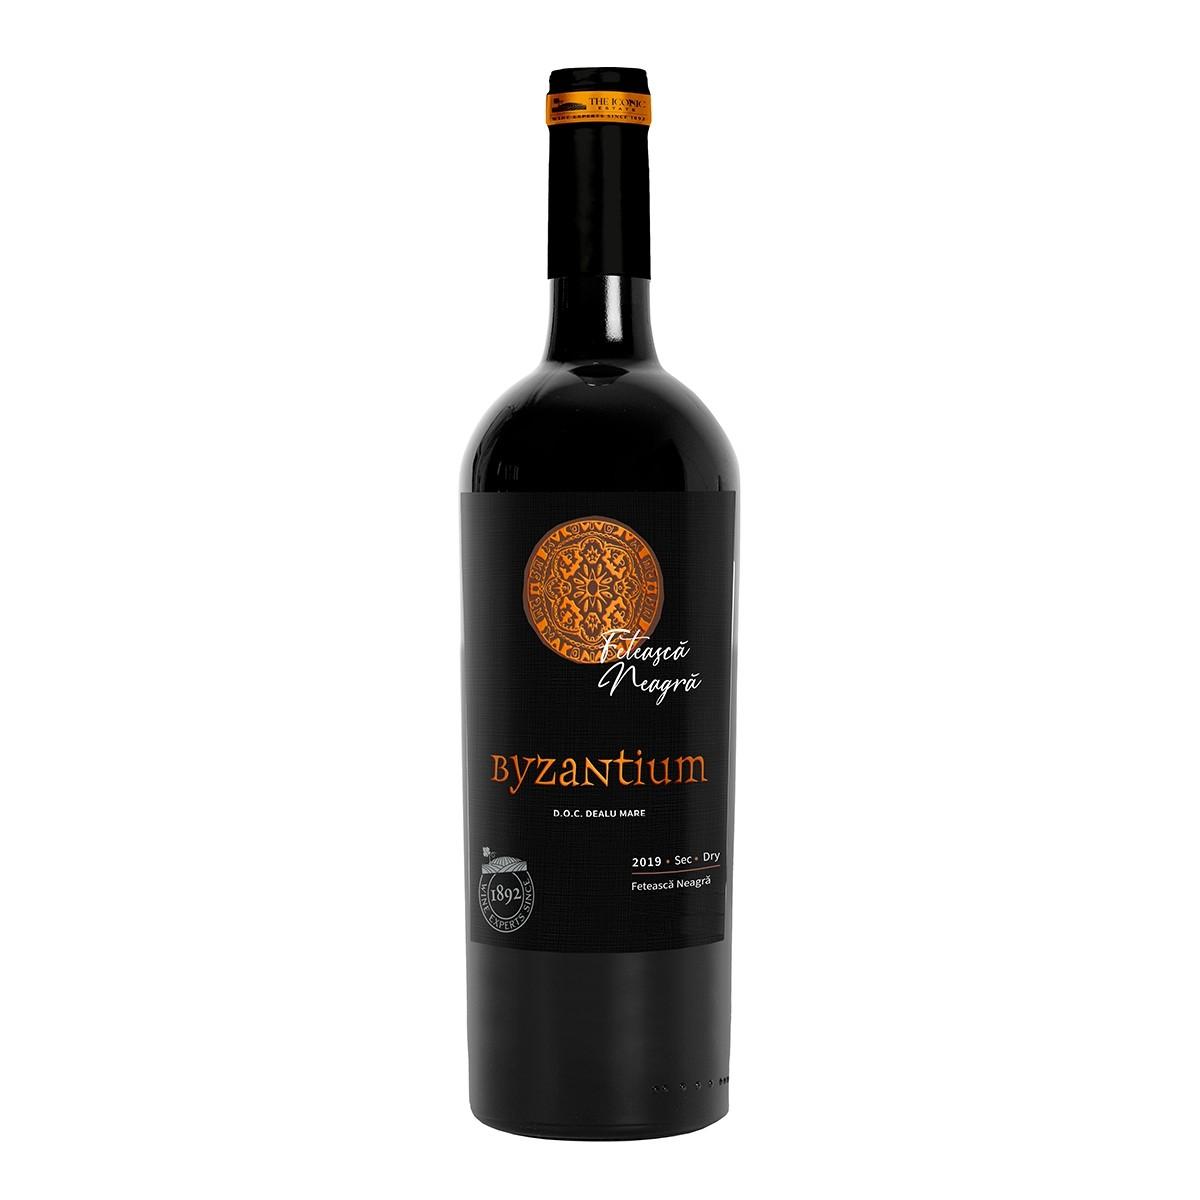 Byzantium Feteasca Neagra